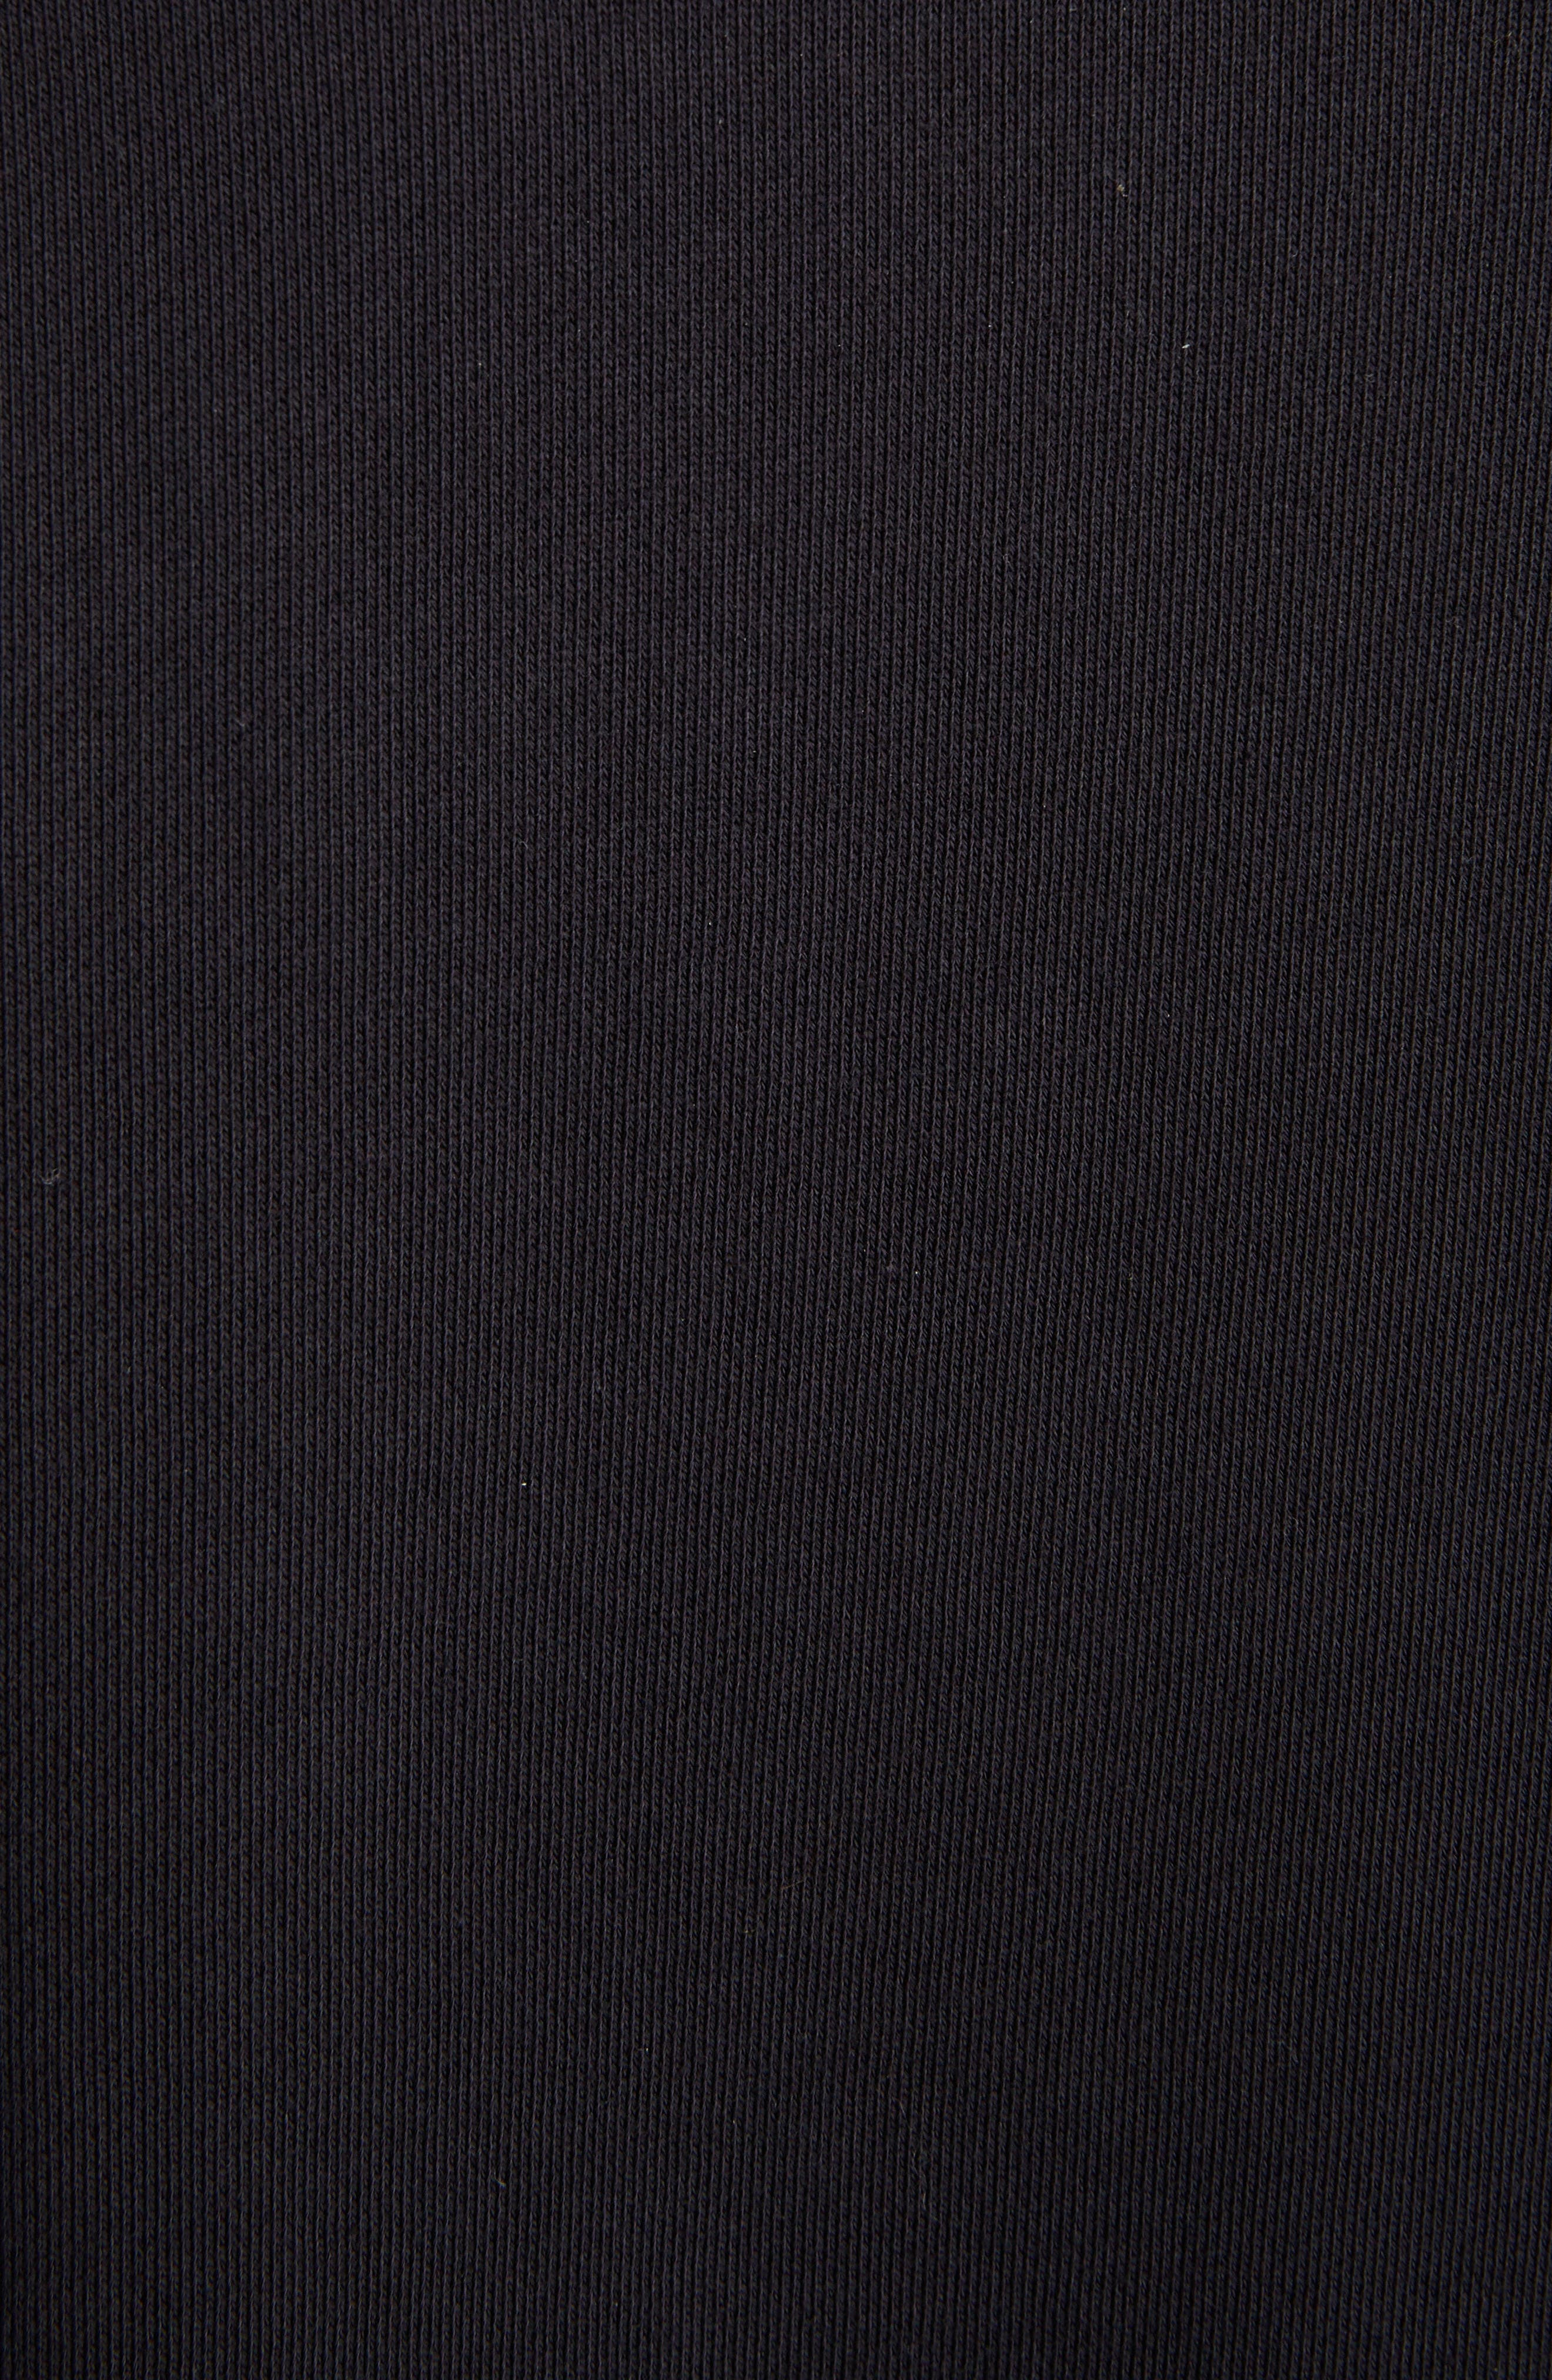 Fan Embroidered Sweatshirt,                             Alternate thumbnail 5, color,                             BLACK